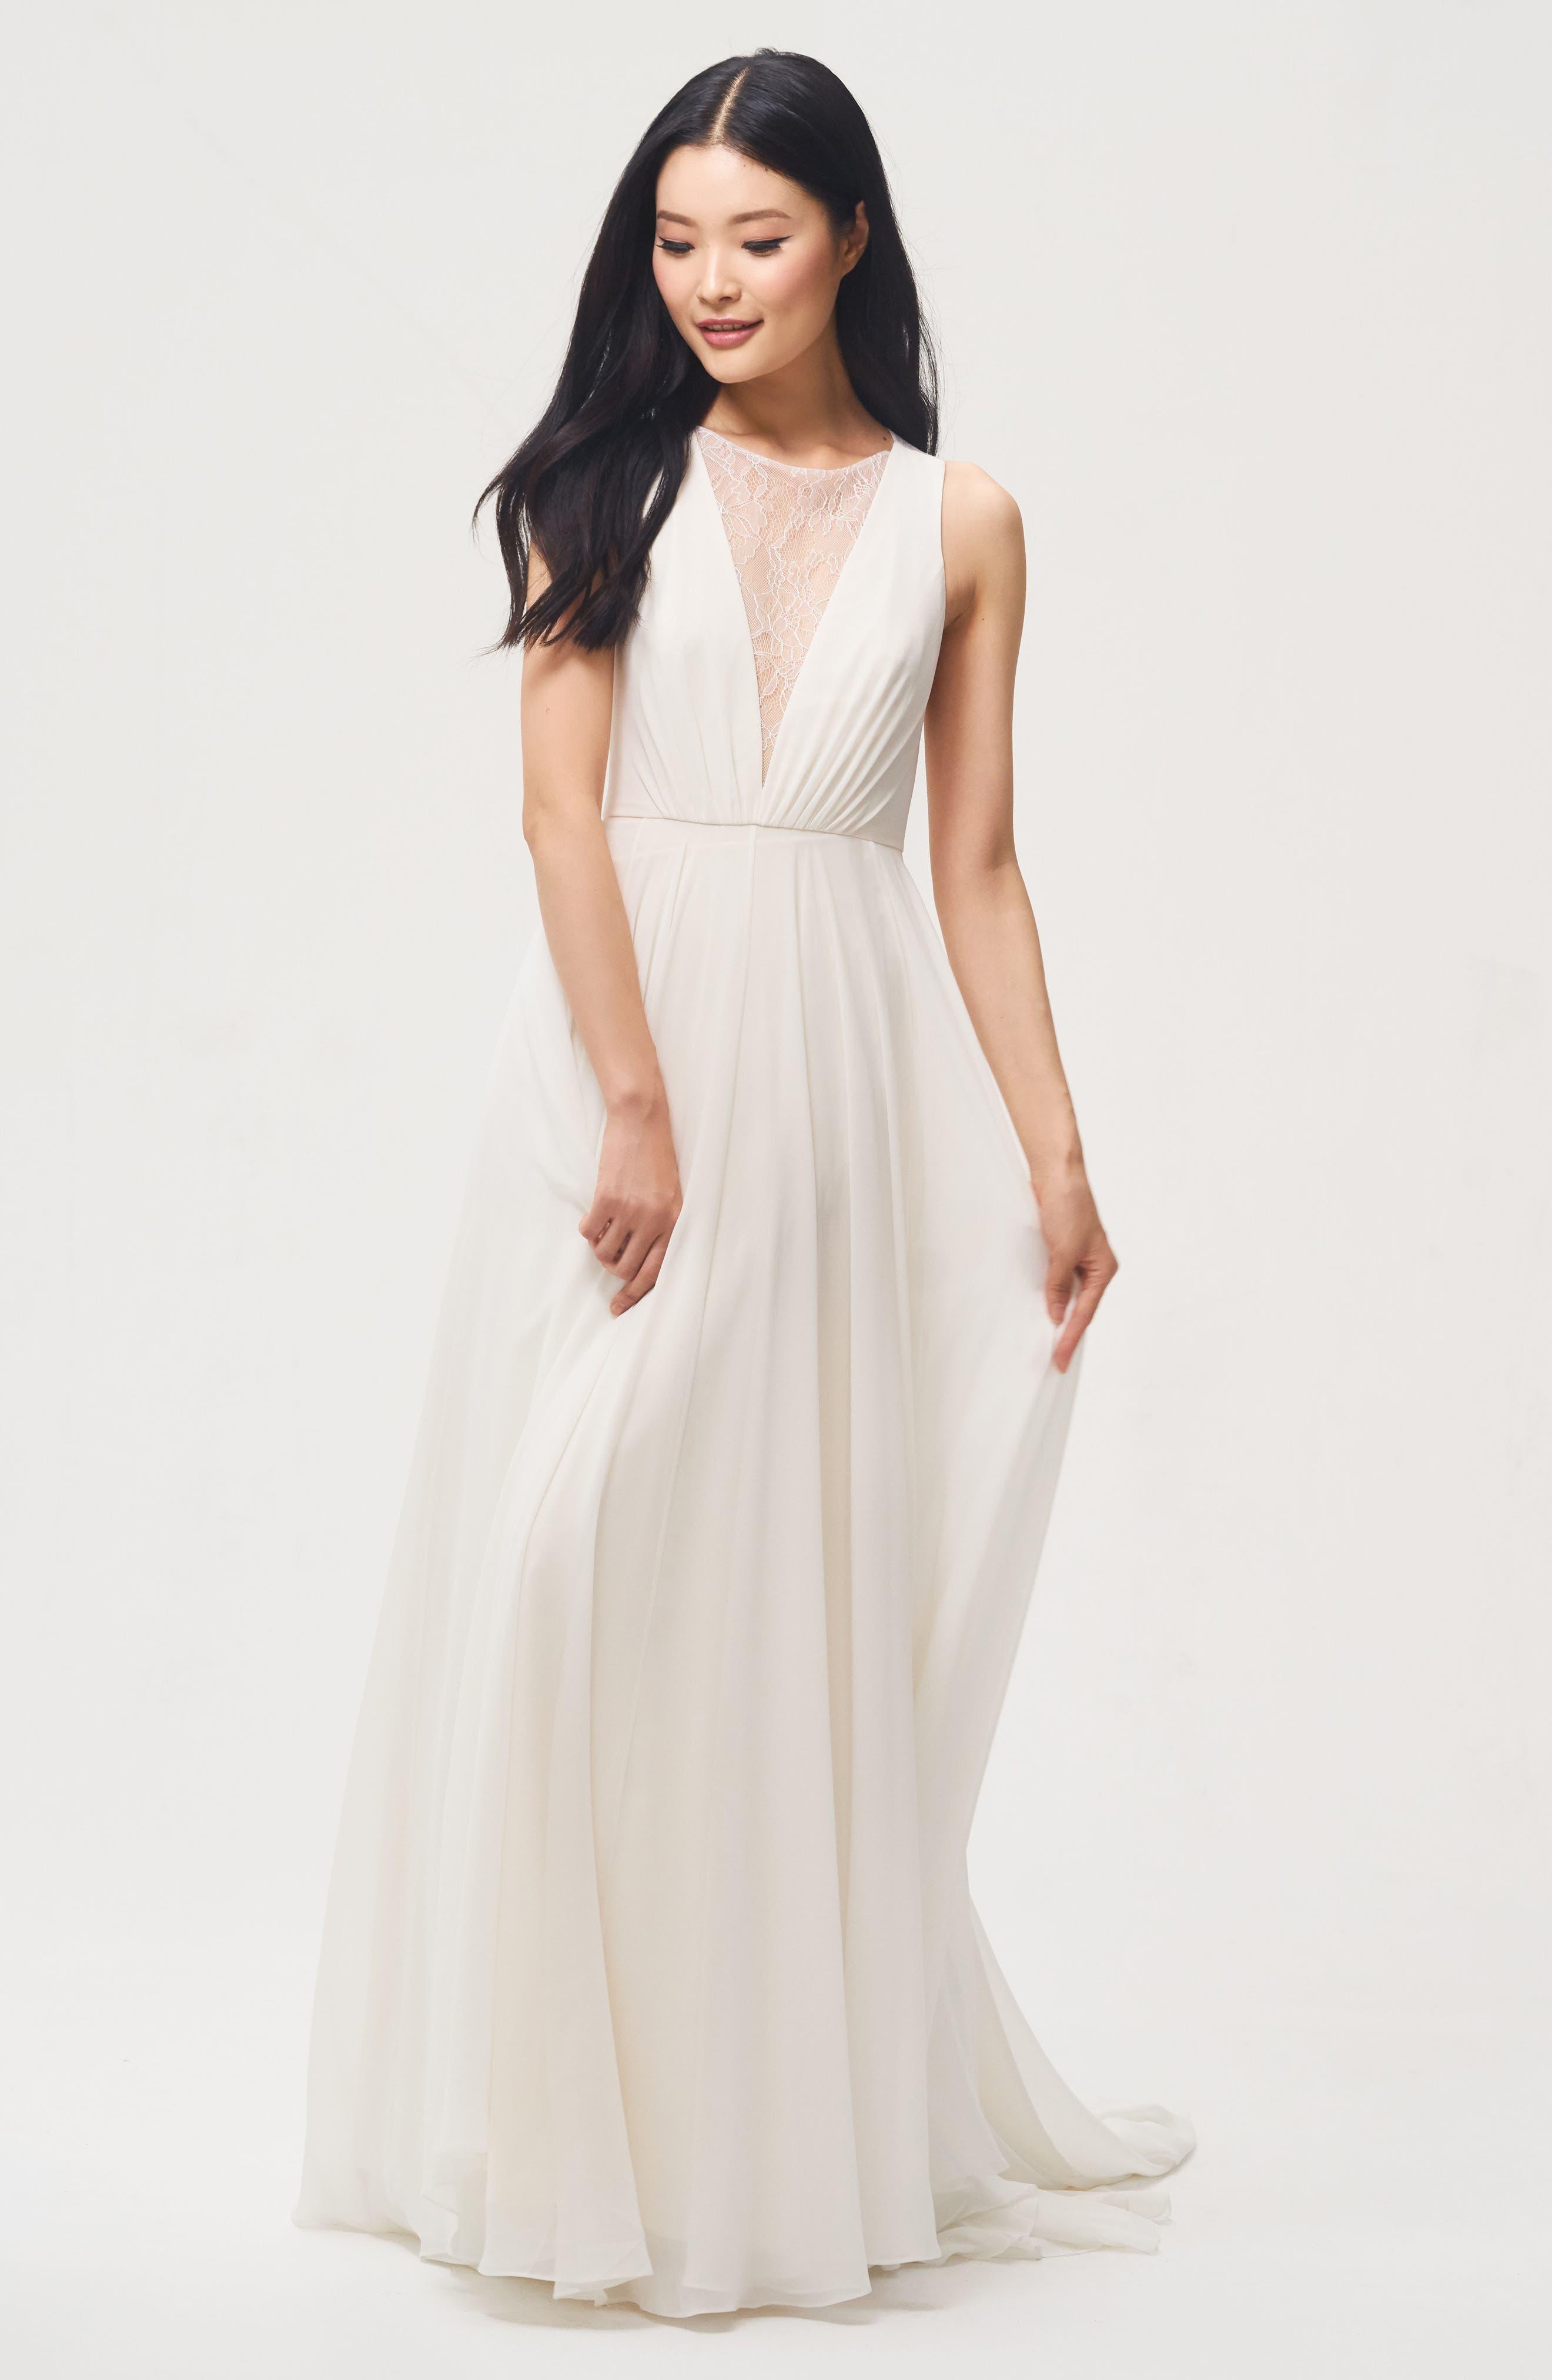 Jenny By Jenny Yoo Fallon Lace & Chiffon A-Line Gown, Ivory